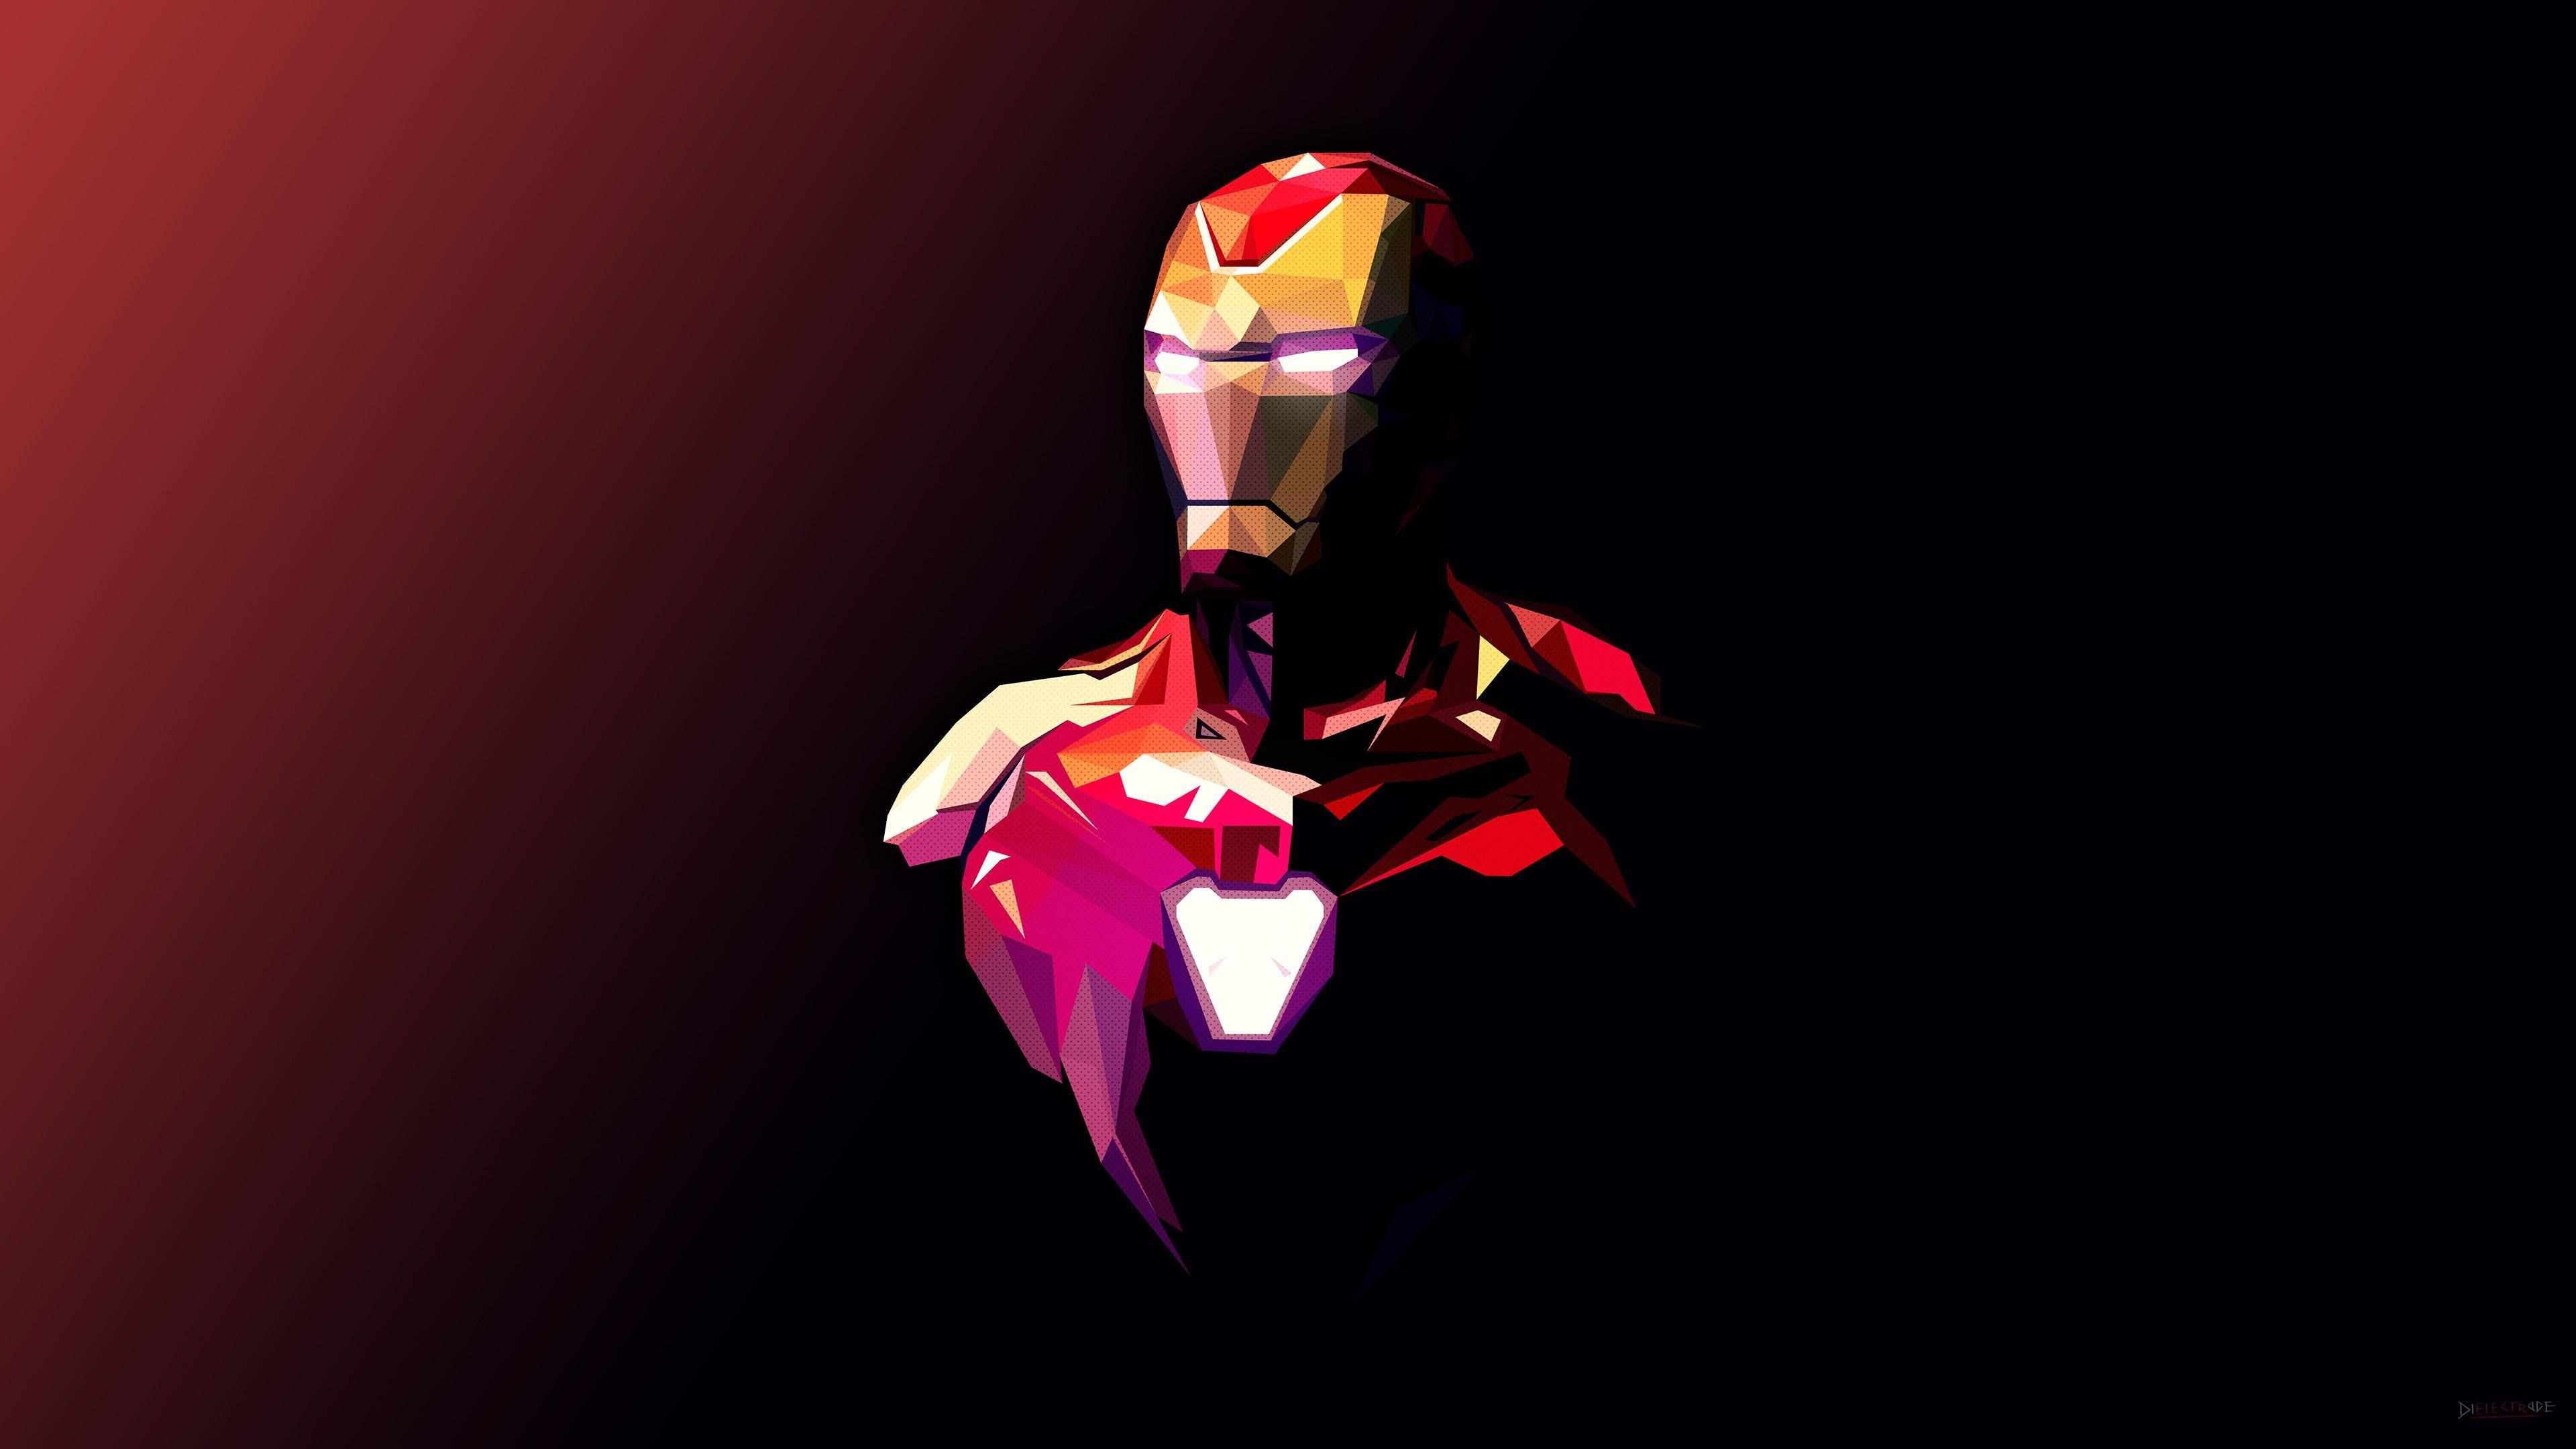 wallpaper hd,iron man,fictional character,superhero,action figure,animation